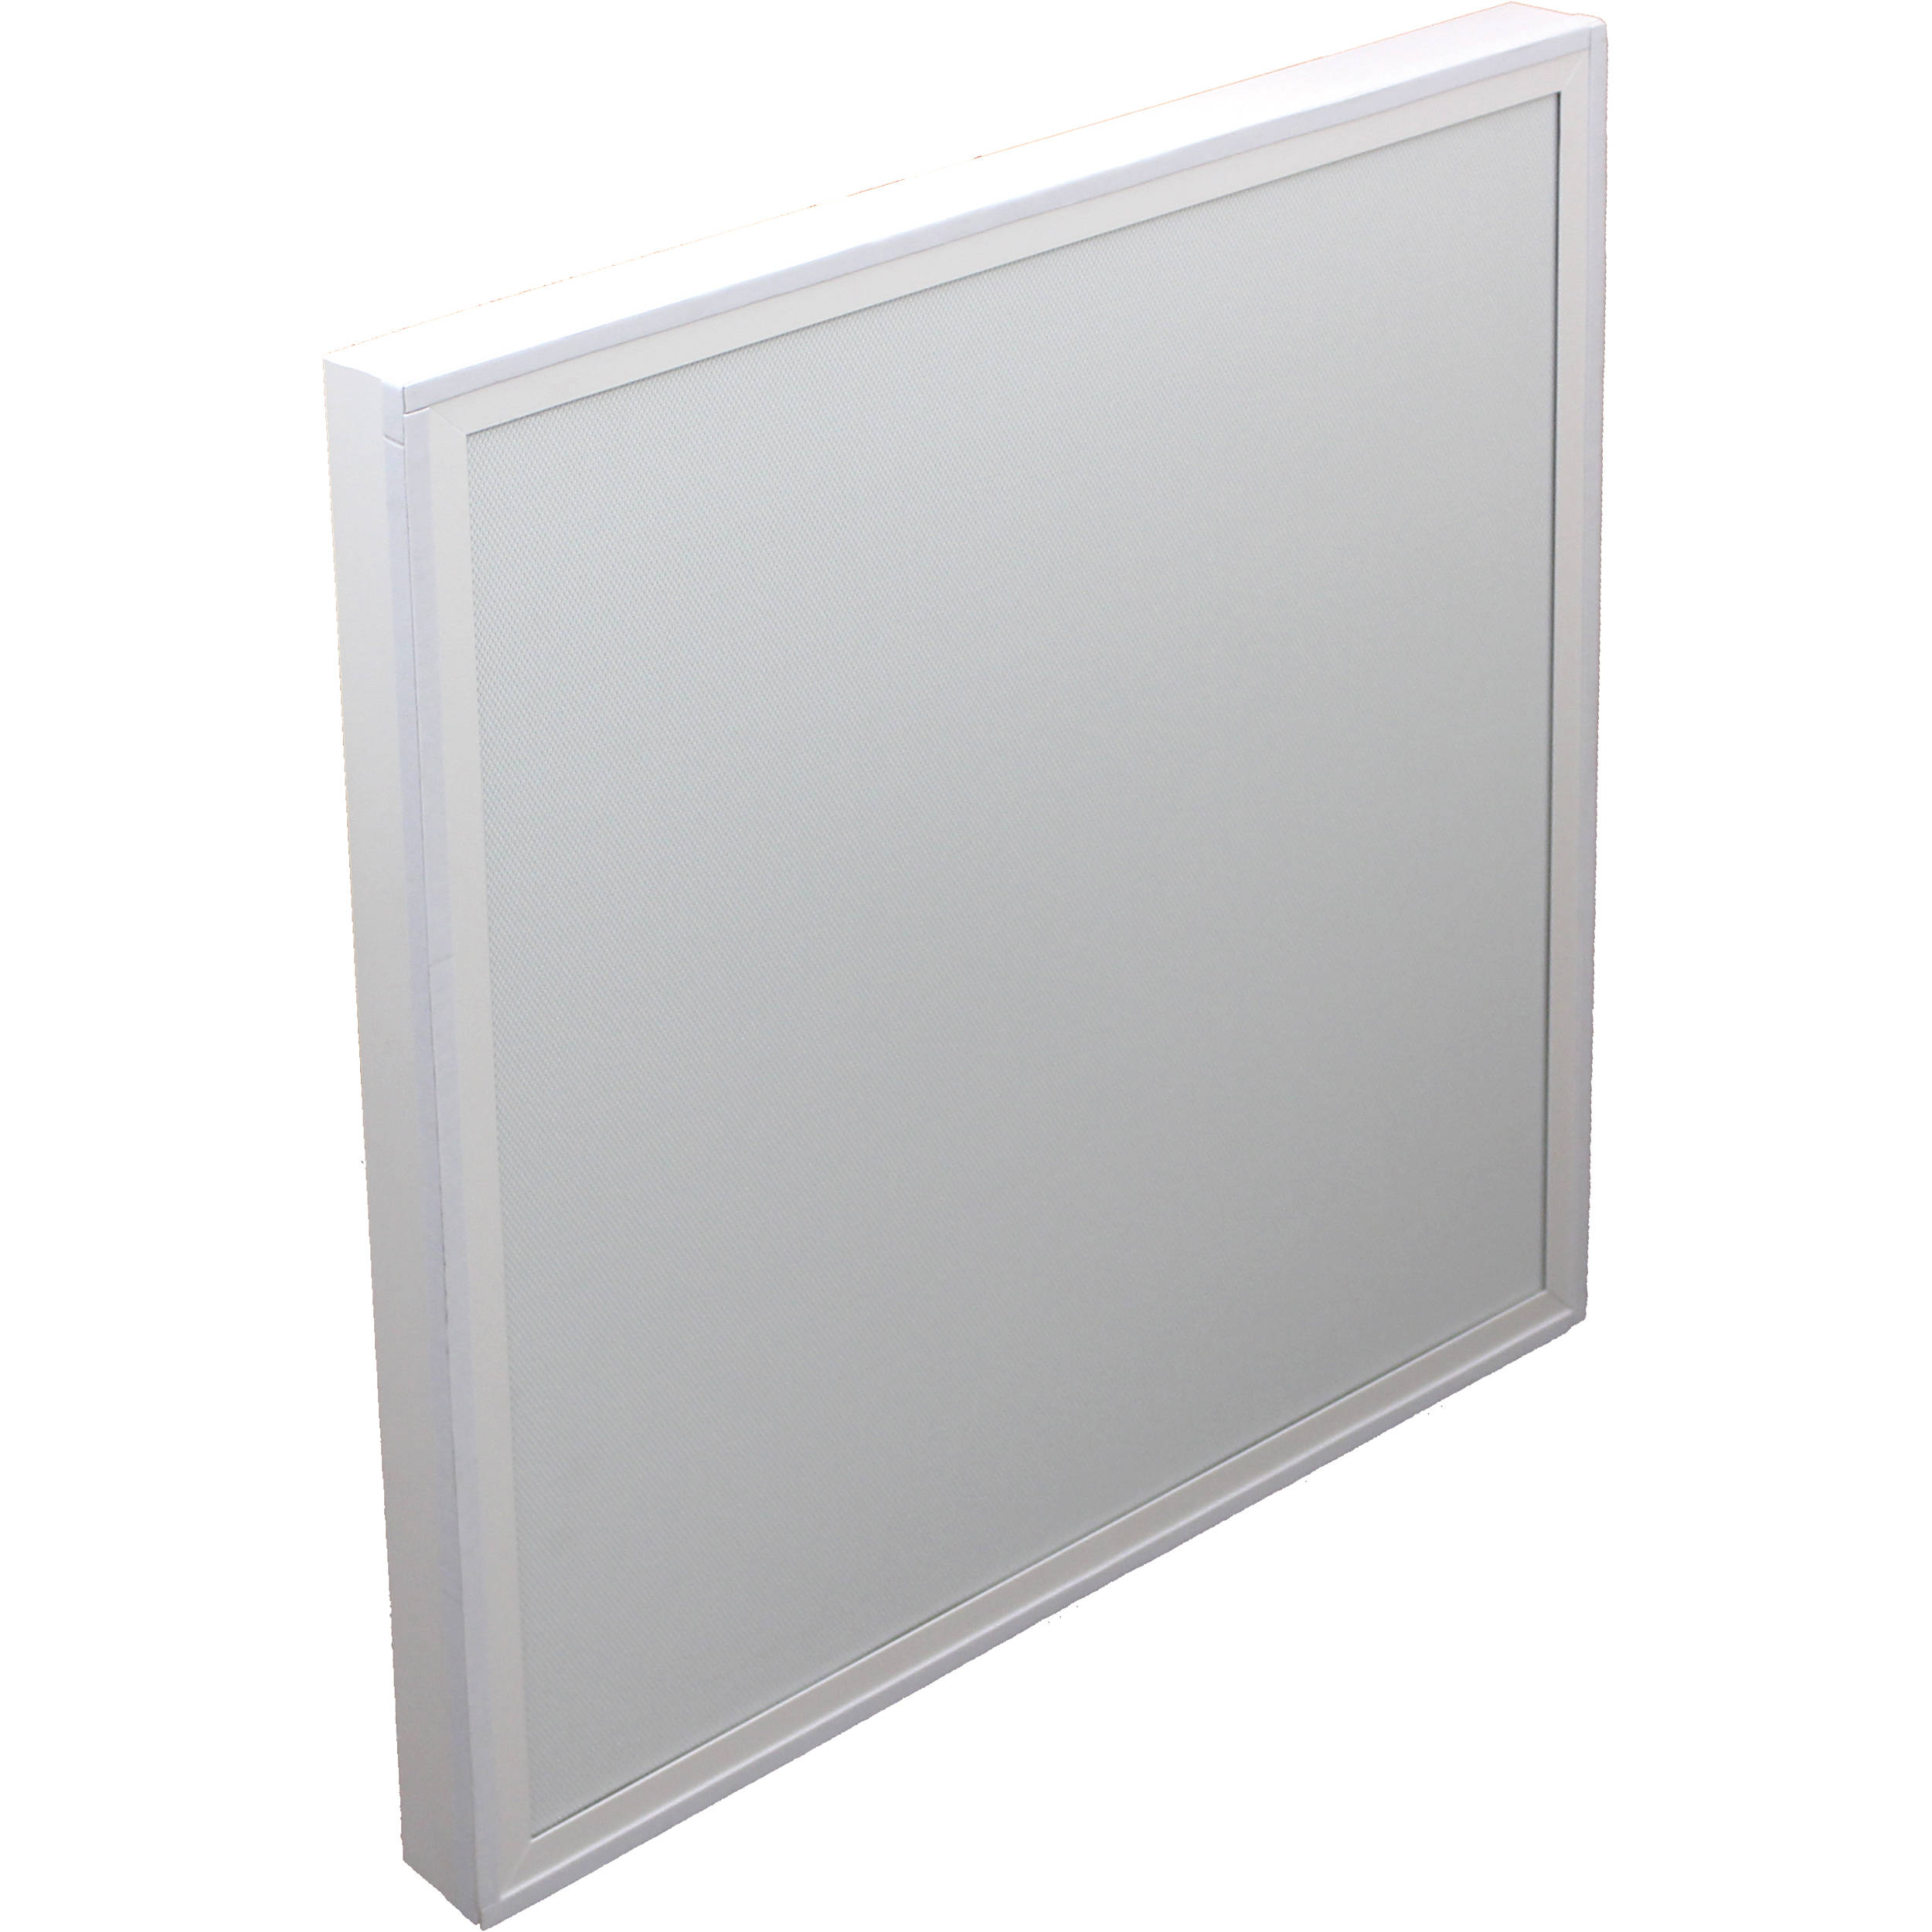 Aurora Multimedia Skr 22t Xfr 25w Flat 2 X Ceiling Tile